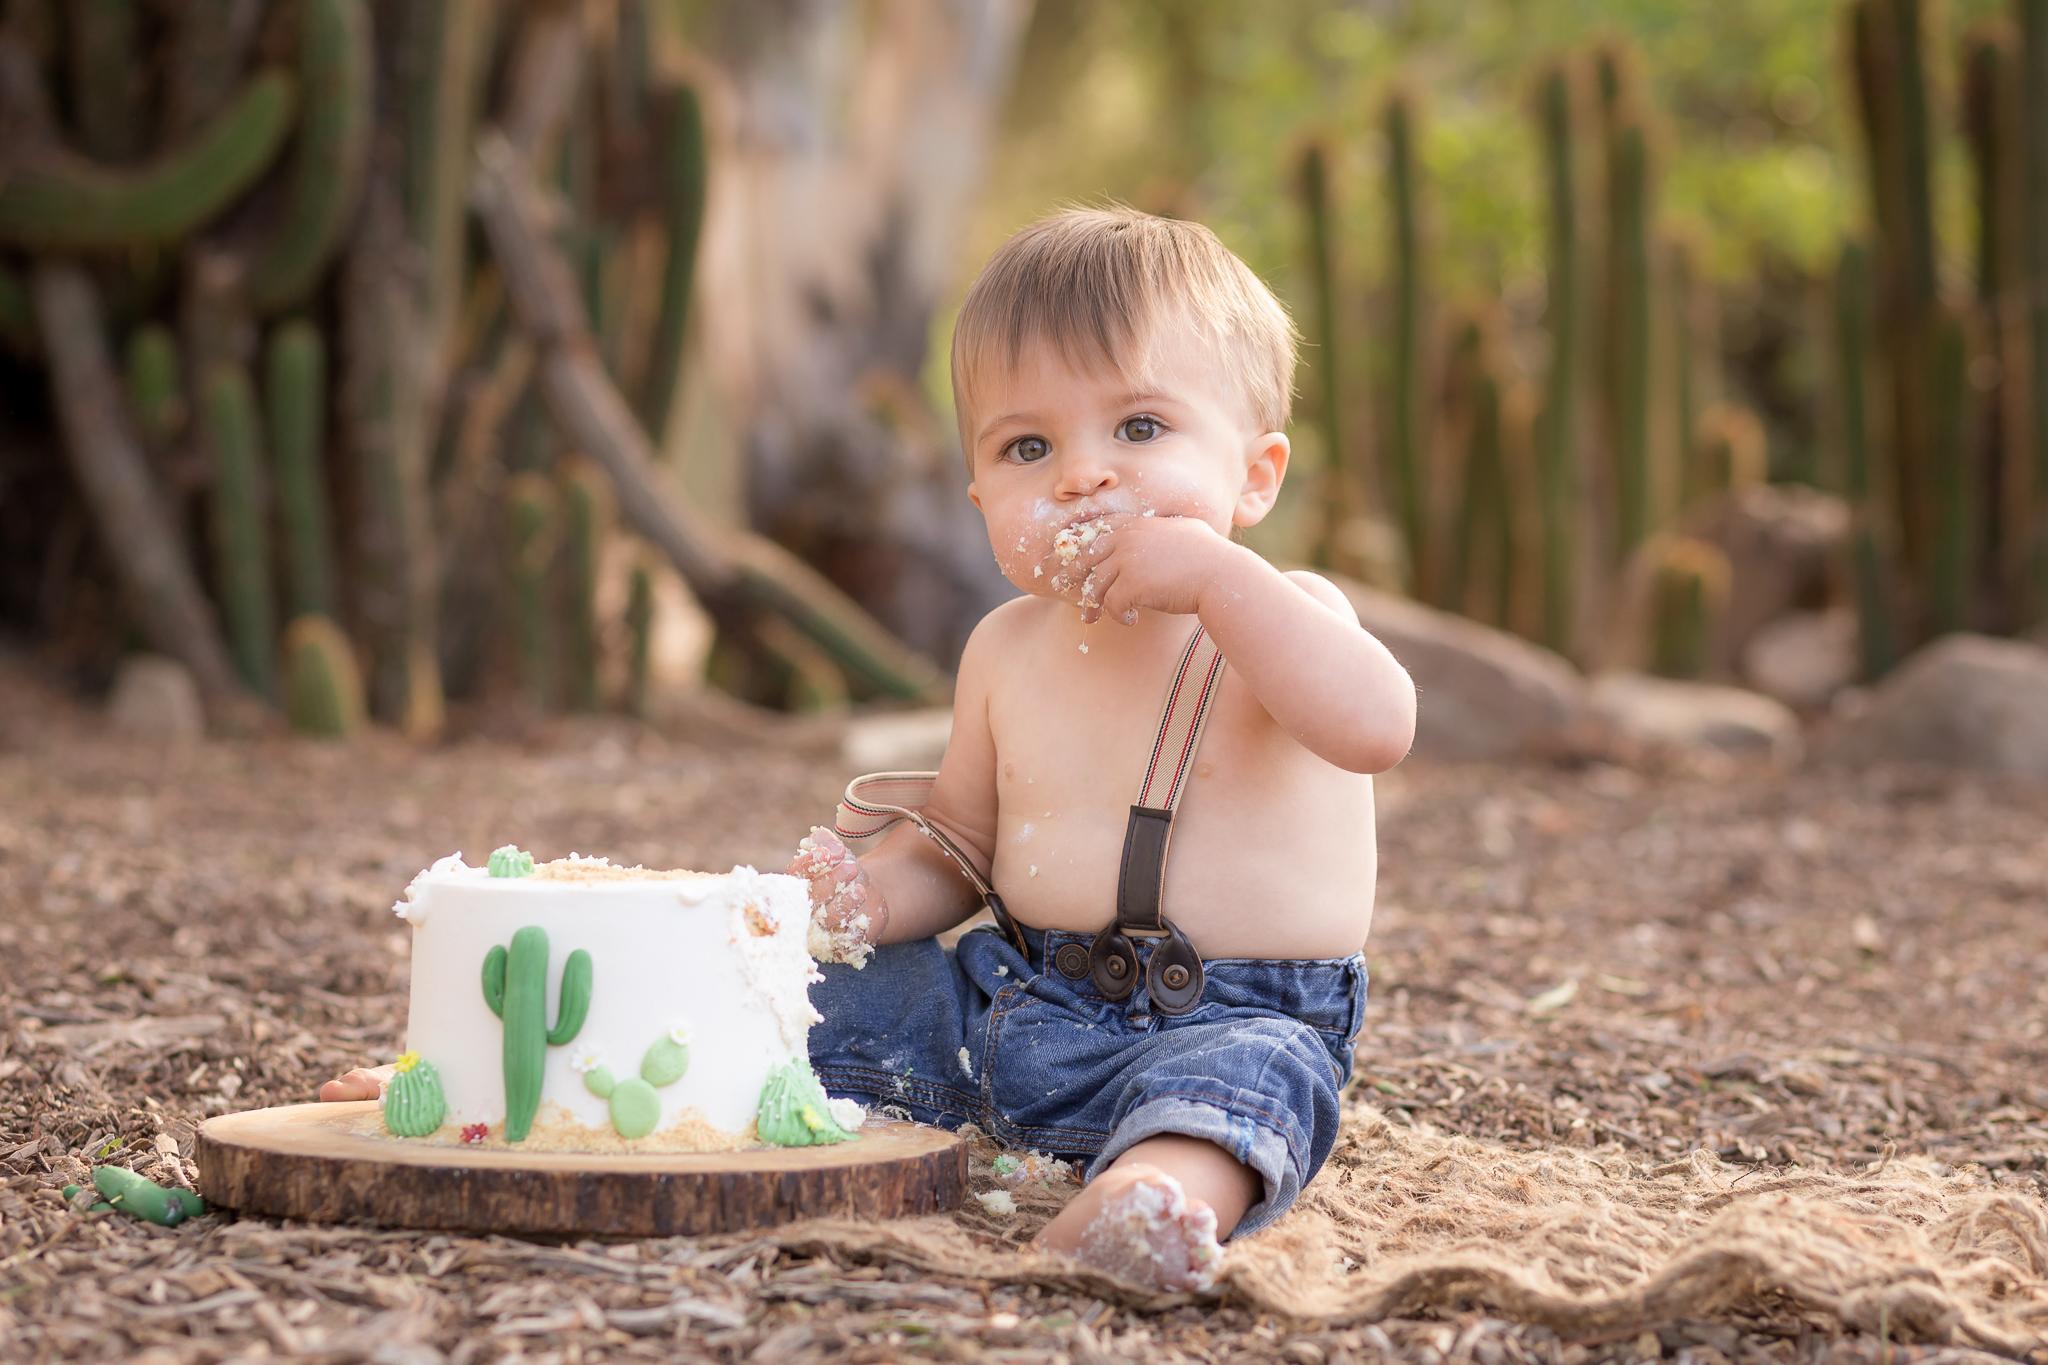 Cactus Cowboy Southwestern Cake Smash- Oh My Goddard Photography - San Diego Oceanside Cake Smash Photographer-23.jpg